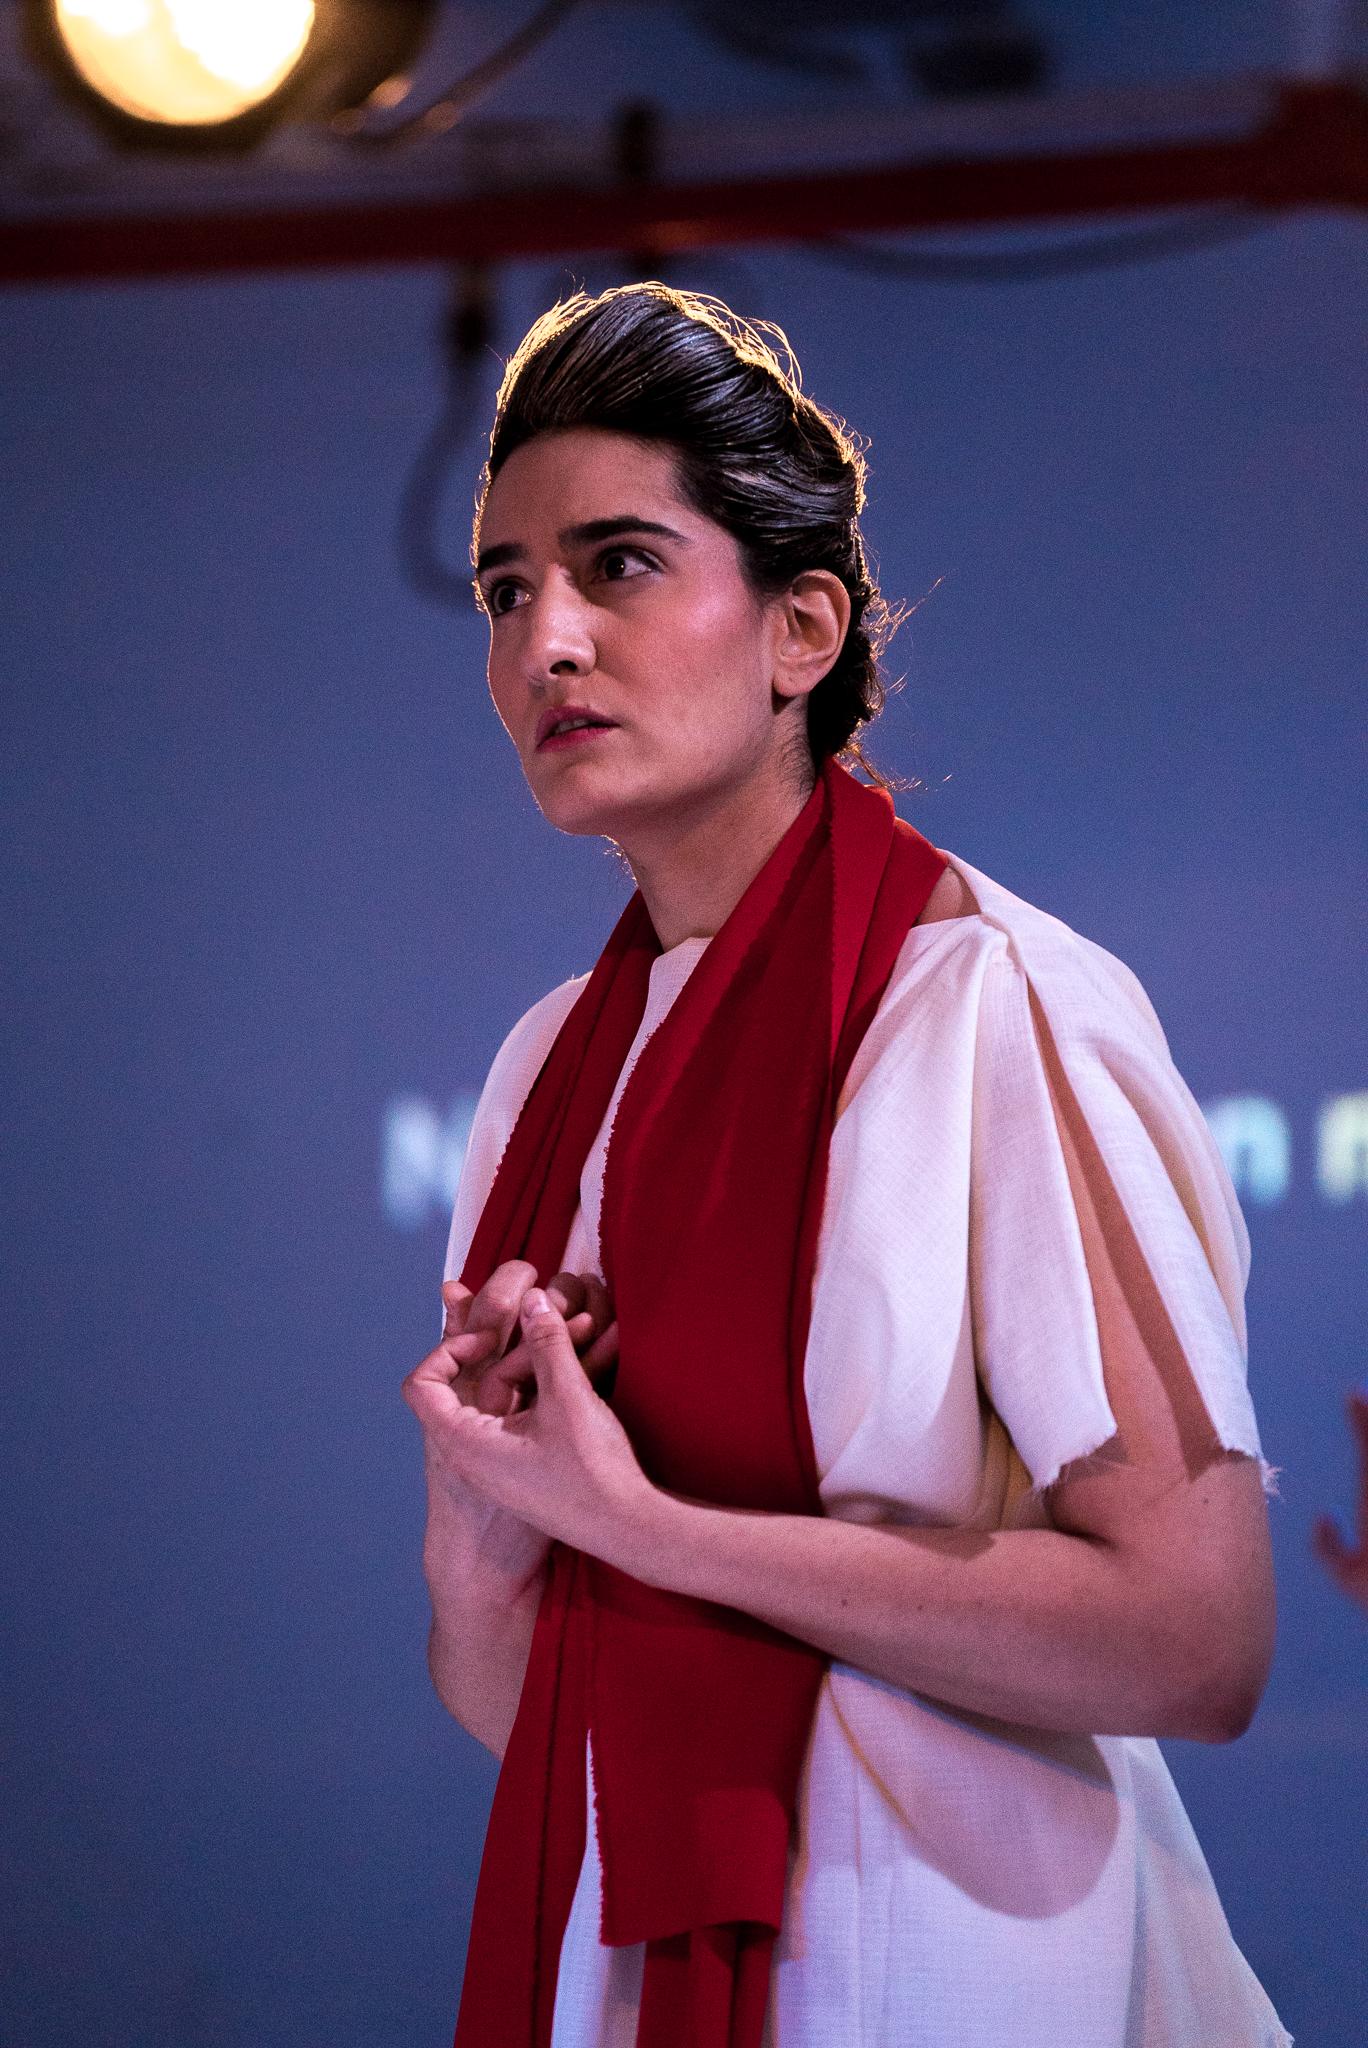 Aumna Iqbal as Orfeo. Photo credit: Lucas Godlewski